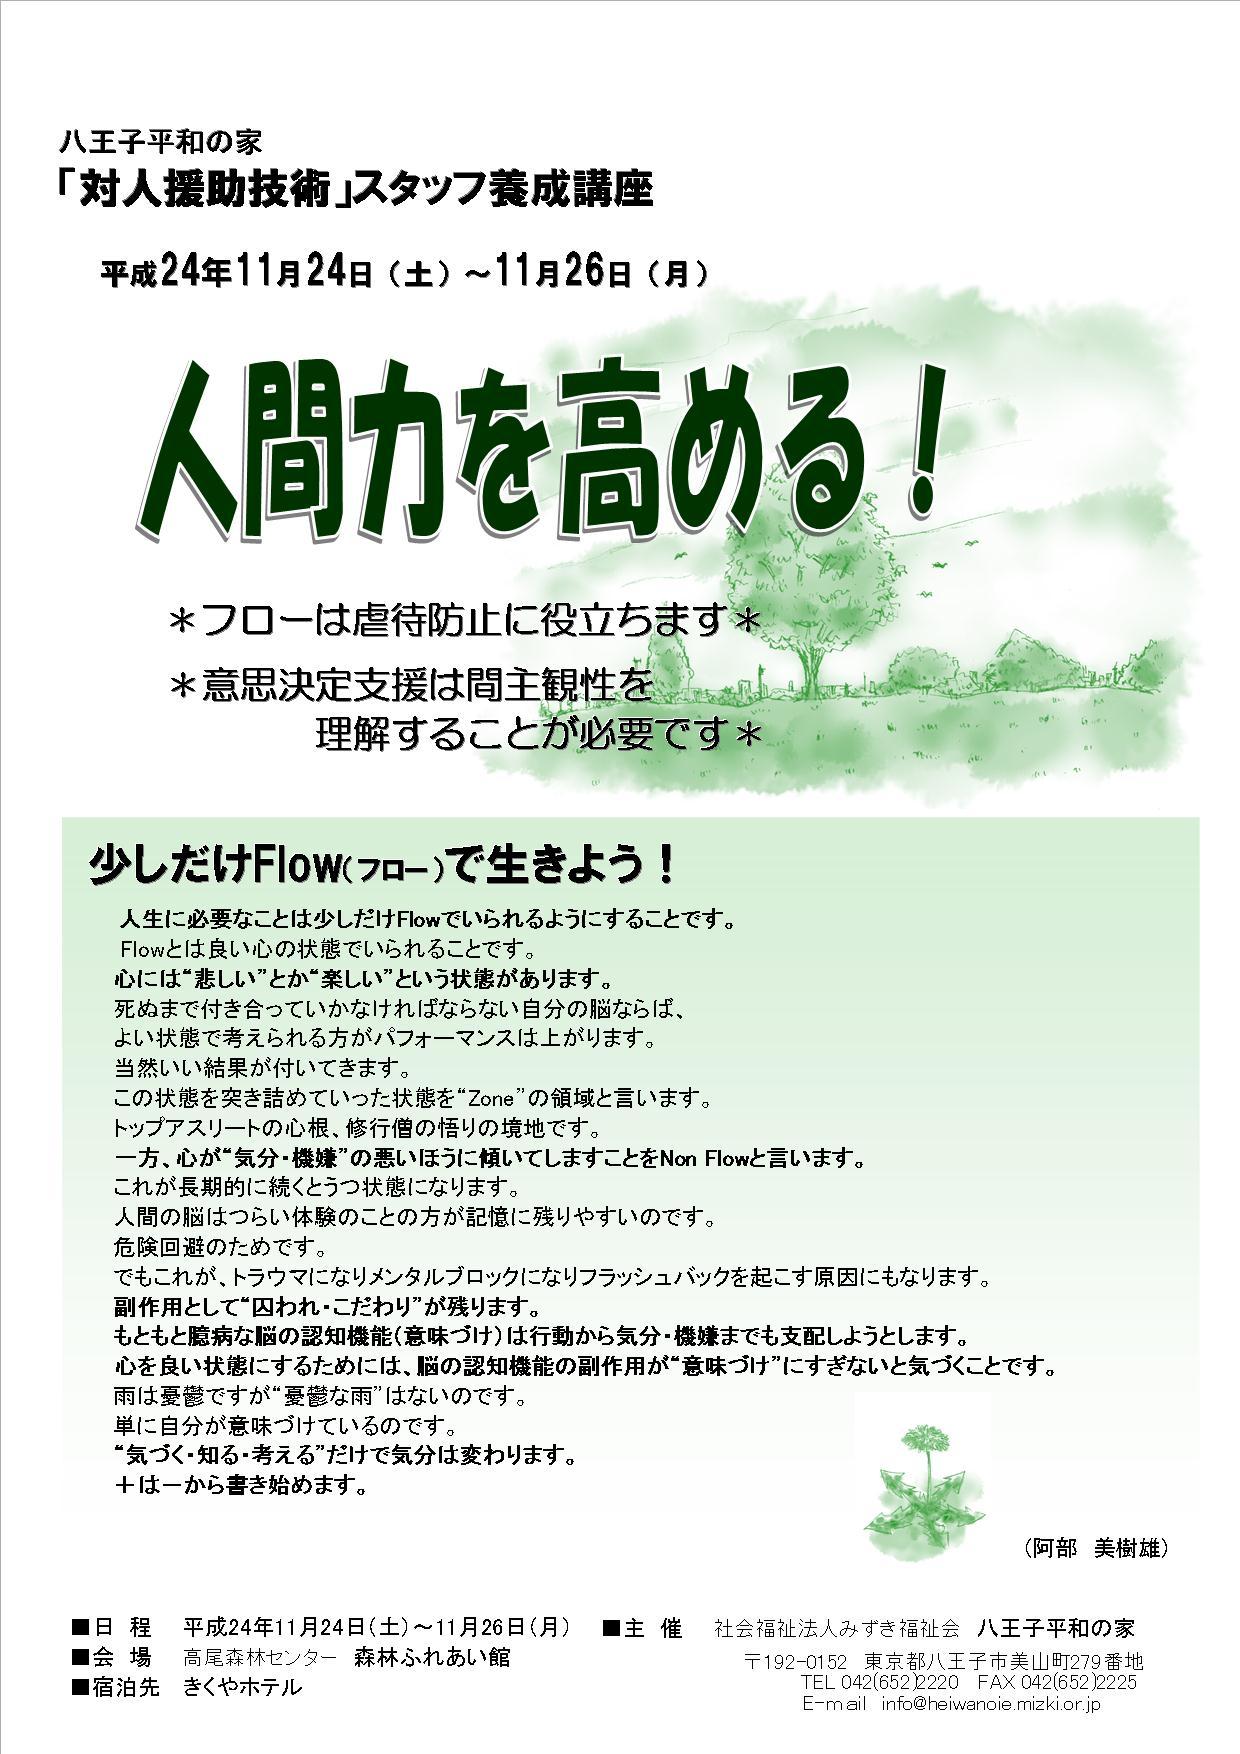 kokoro_2012_aki_1.jpg